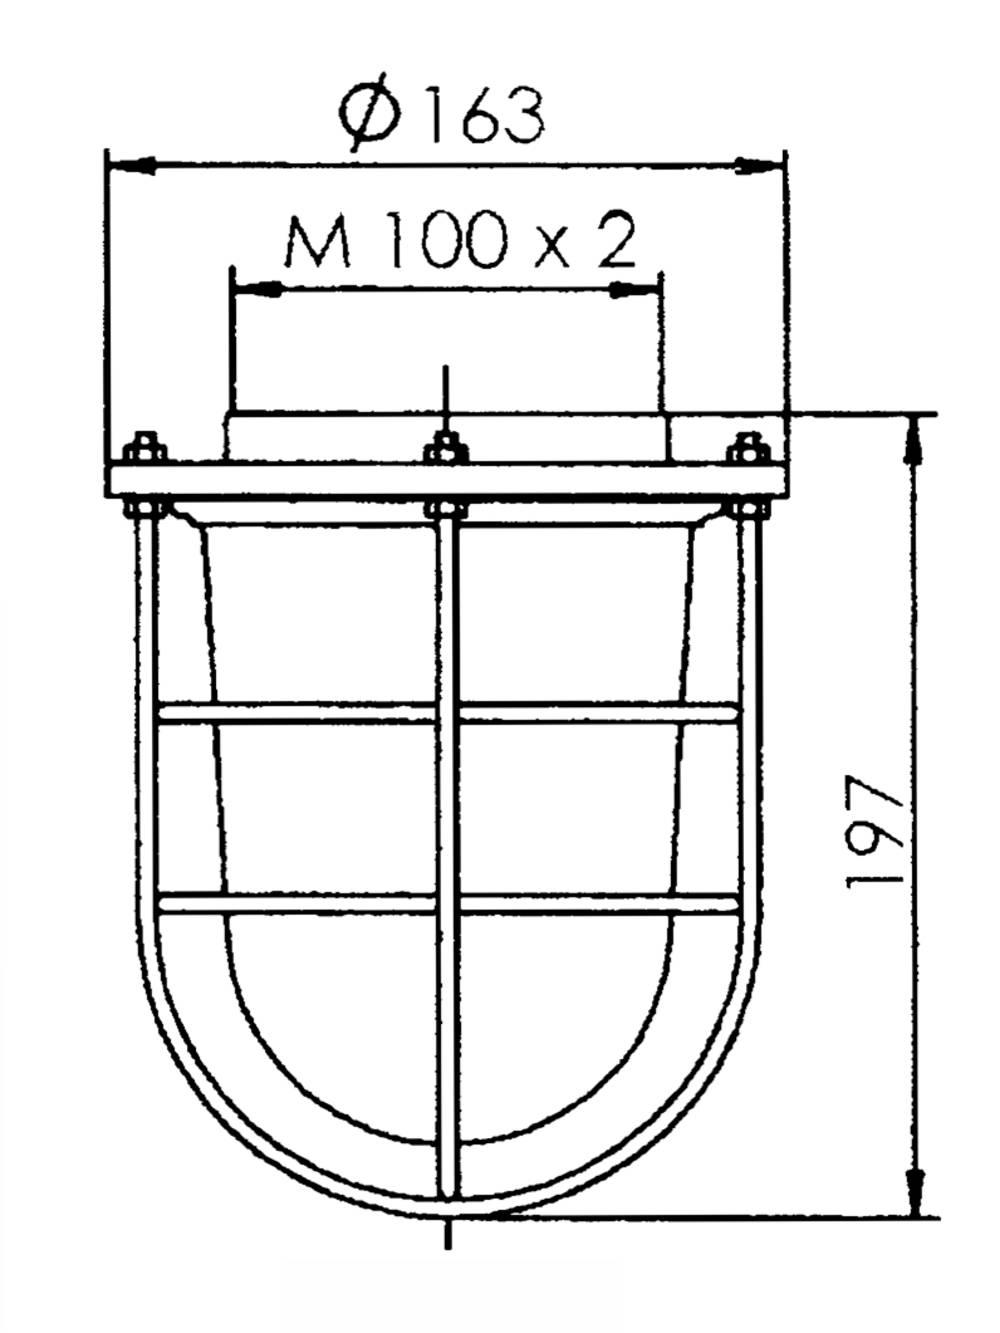 sp 1916 flansch mit glas und korb wiska. Black Bedroom Furniture Sets. Home Design Ideas